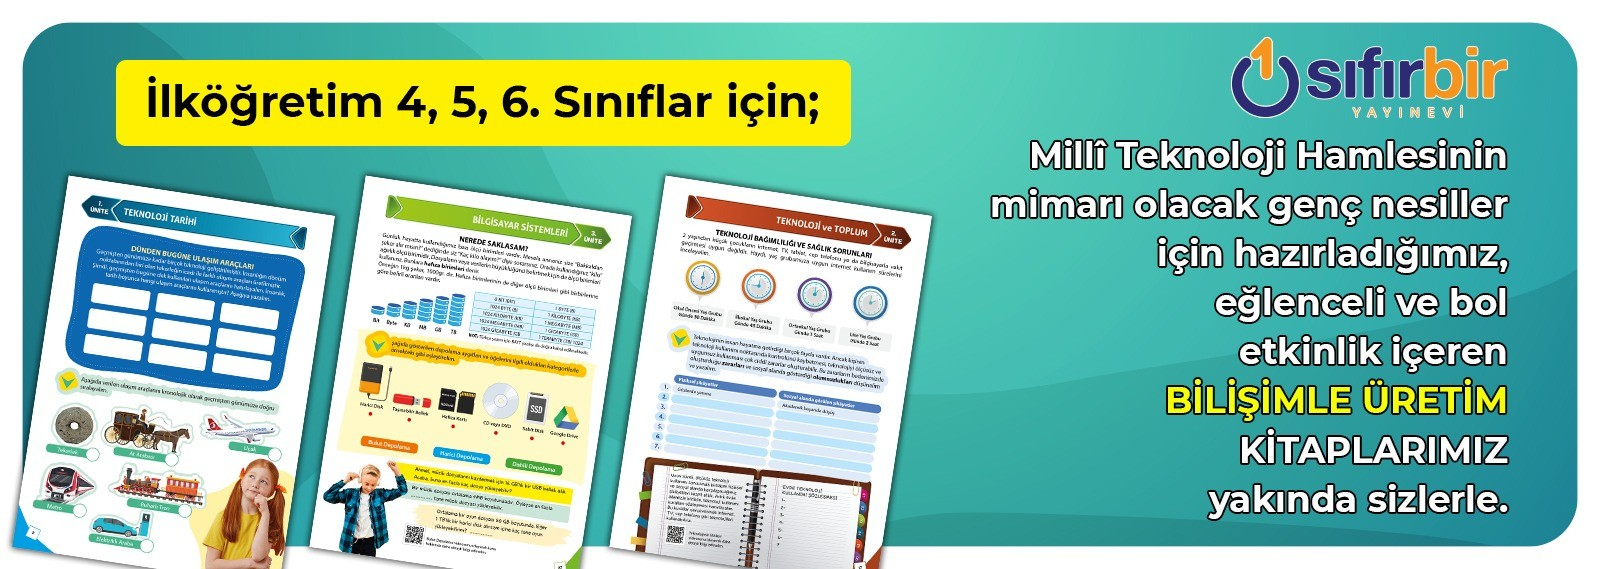 https://www.sifirbiryayinlari.com/modules/iqithtmlandbanners/uploads/images/60b785e59df2b.jpg